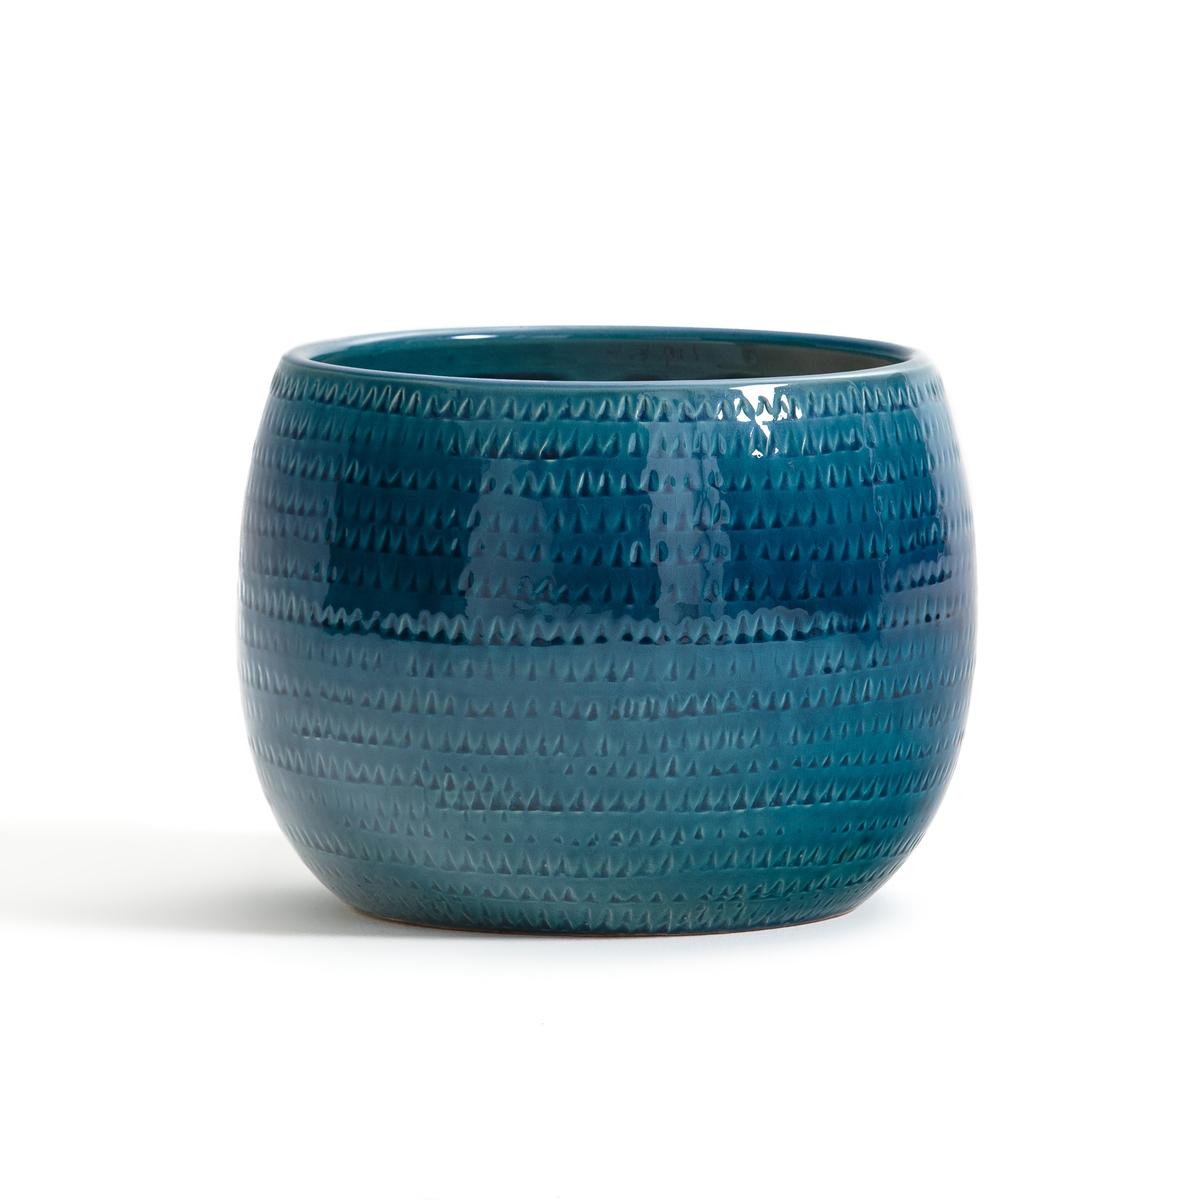 Кашпо из керамики Ø30 x H23 см, Joanis зеркало barbier круглое ø30 см